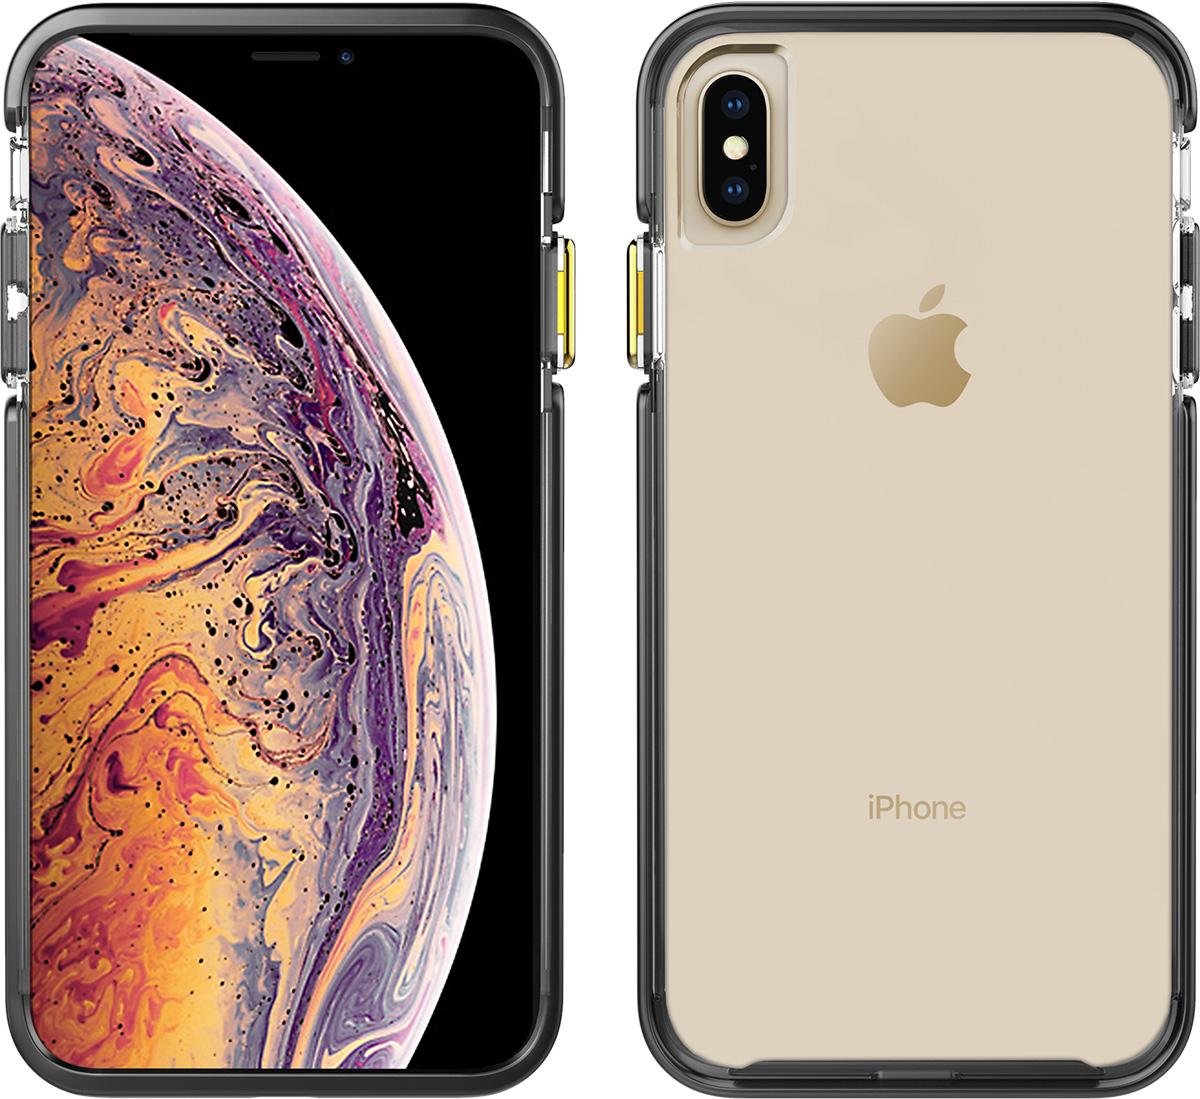 d23e111e898f pelican c43130 apple iphone ambassador black gold phone case